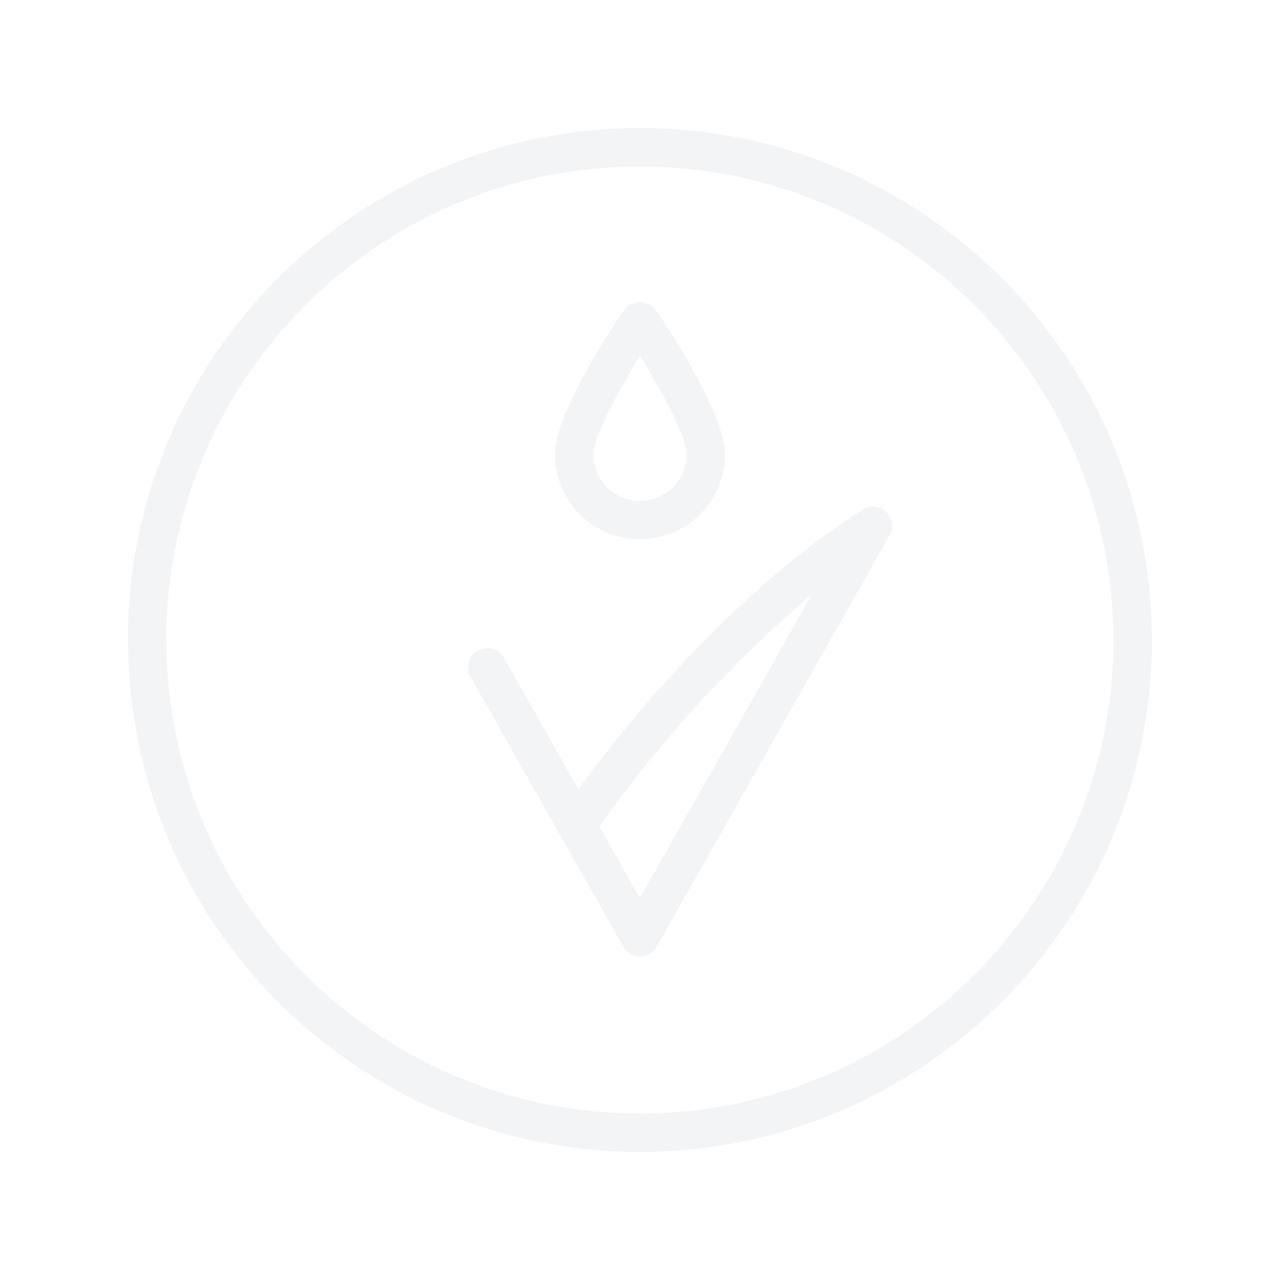 MIZON Enjoy Vital-Up Time Lift Up Mask 25ml